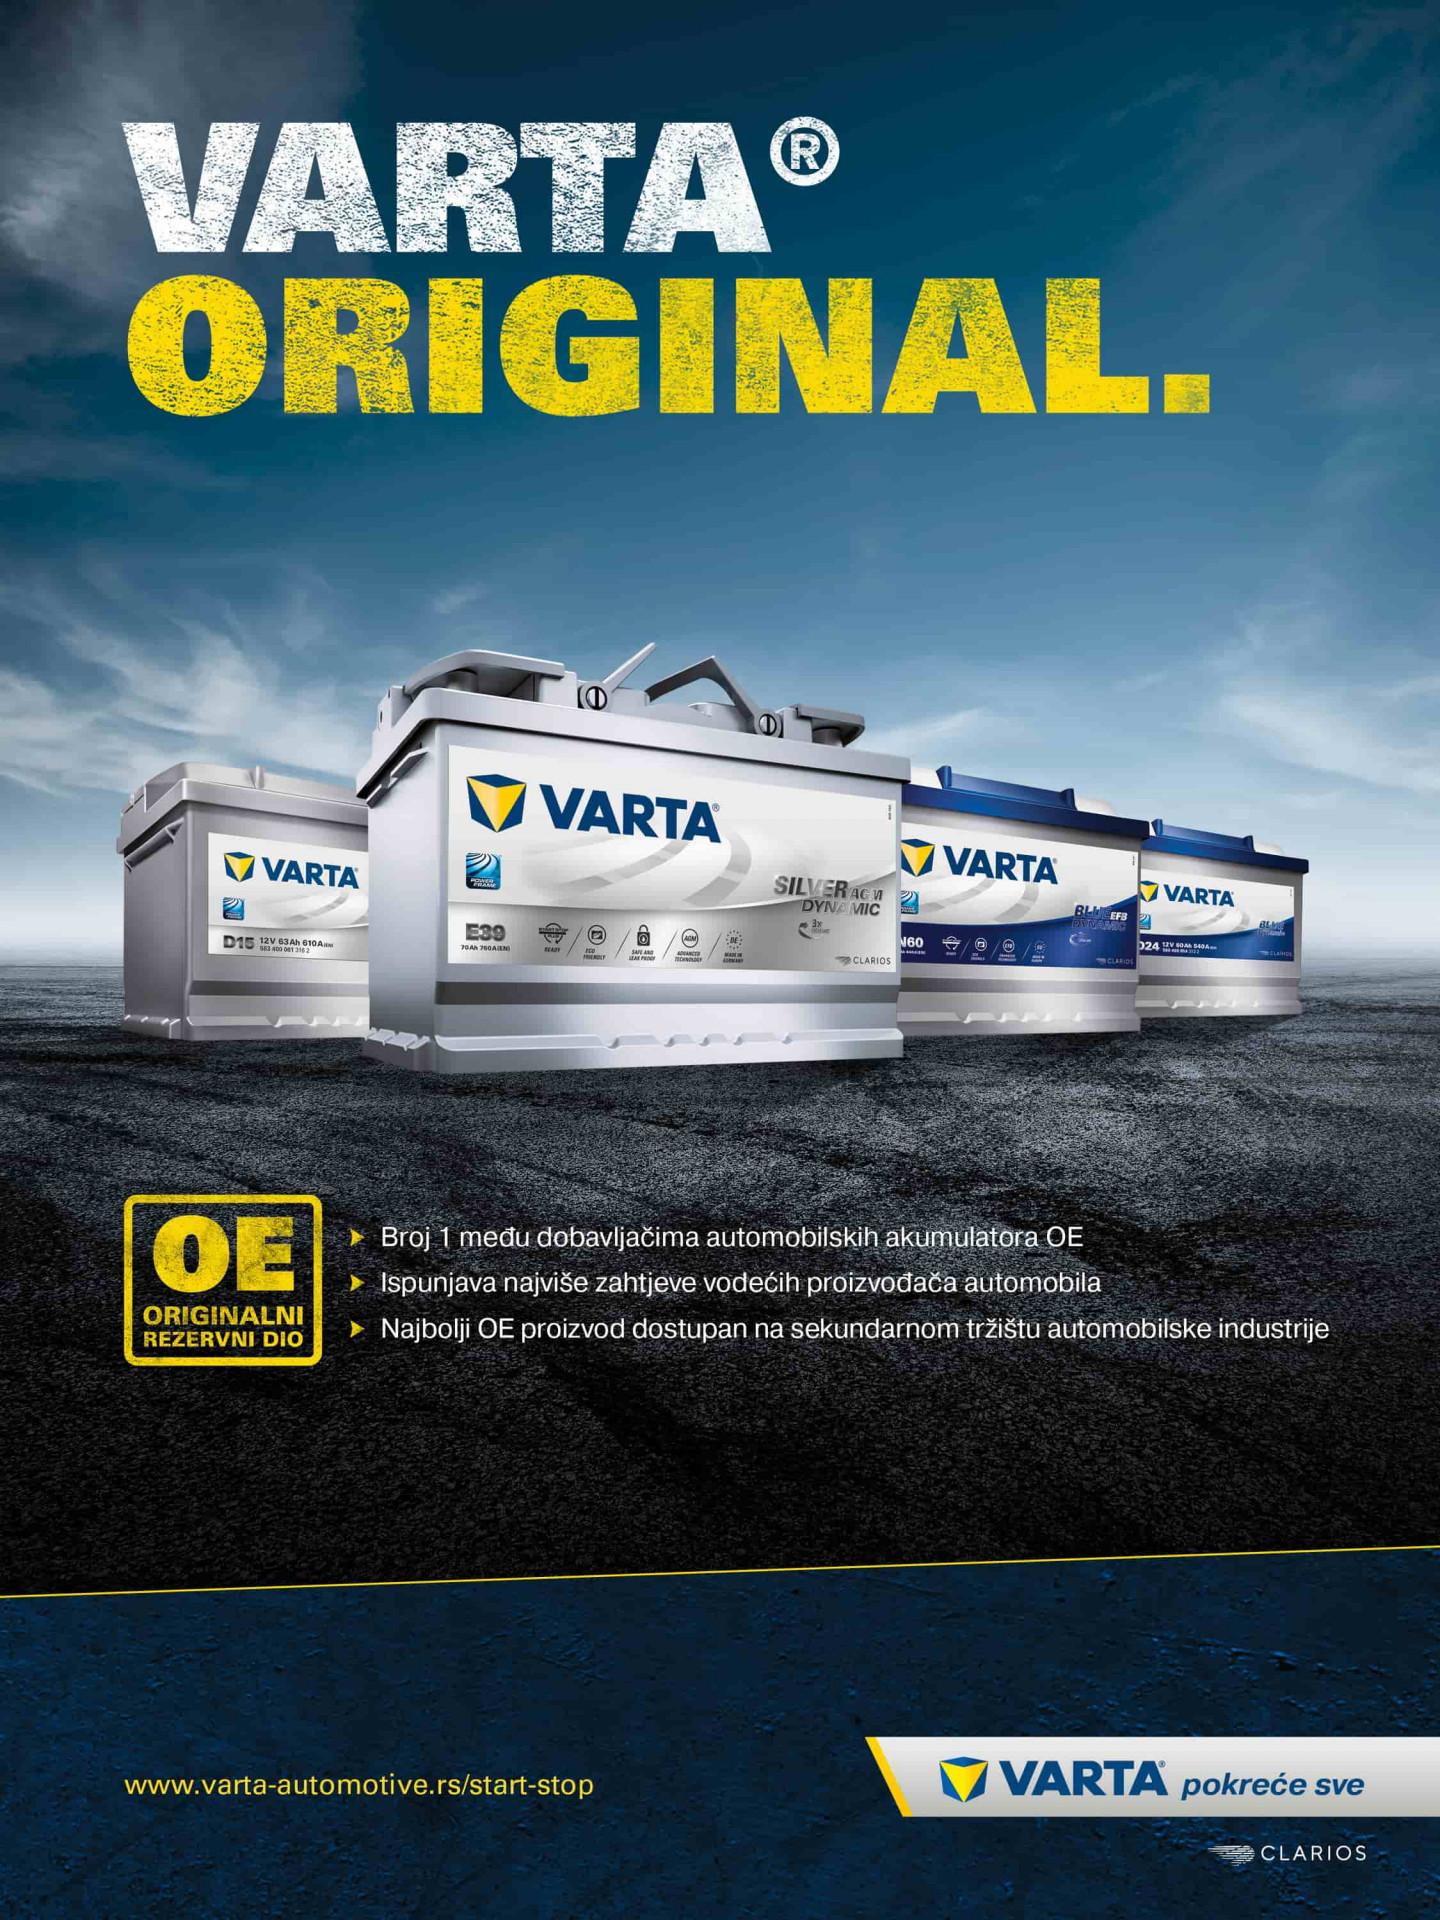 https://www.hr.varta-automotive.com/hr-hr?_ga=2.110591685.1718580059.1607591524-314301907.1607591524